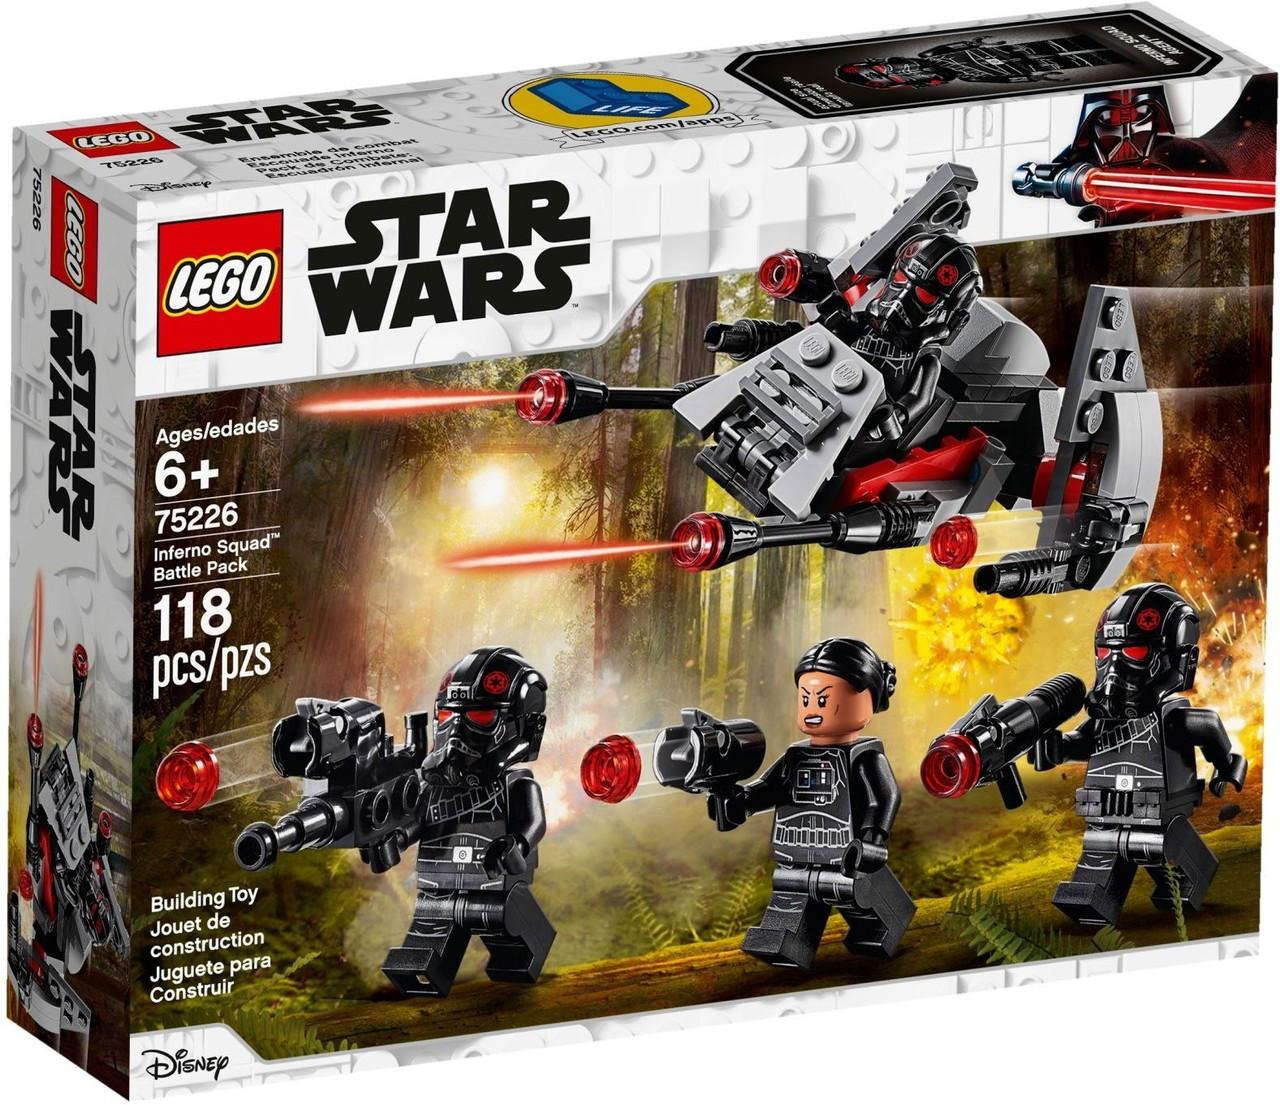 Lego Star Wars Inferno Squad Battle Pack Set 75226